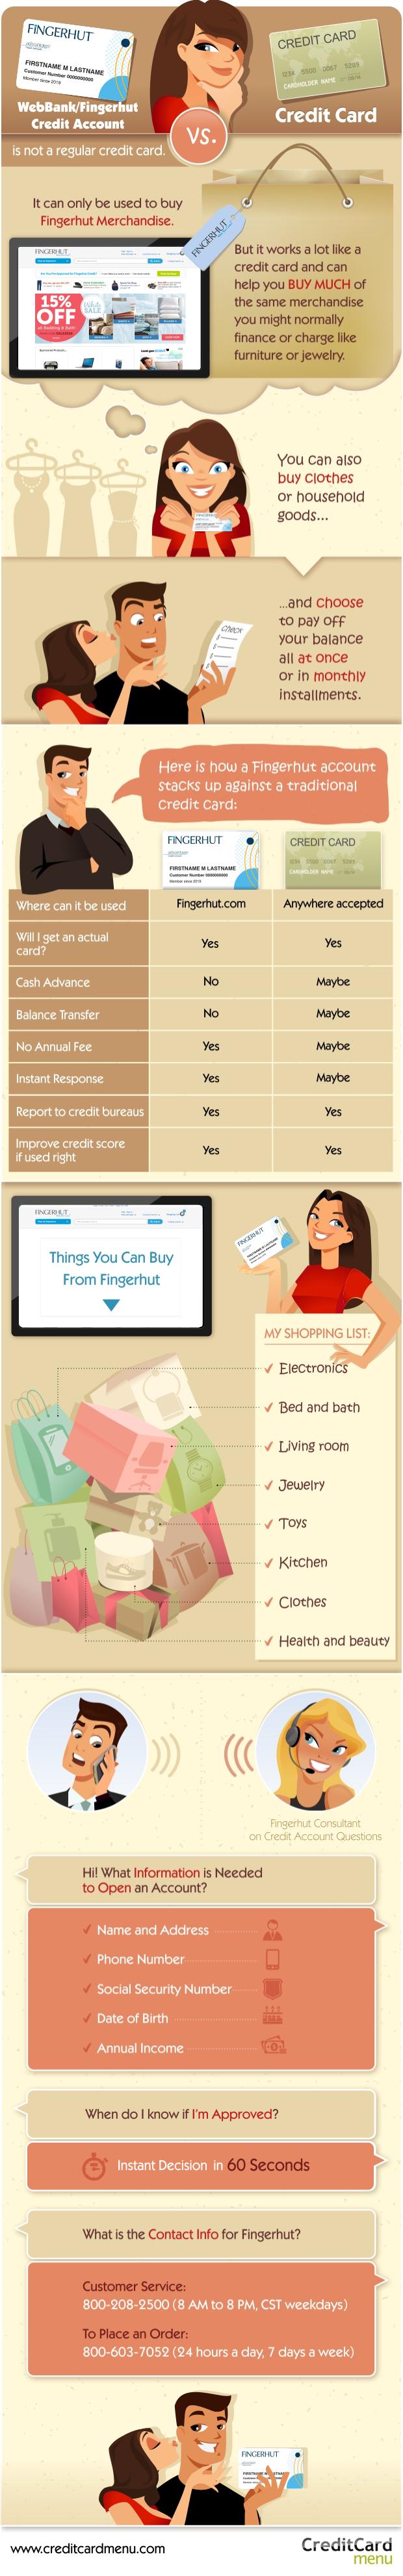 Fingerhut Credit Account Infographic